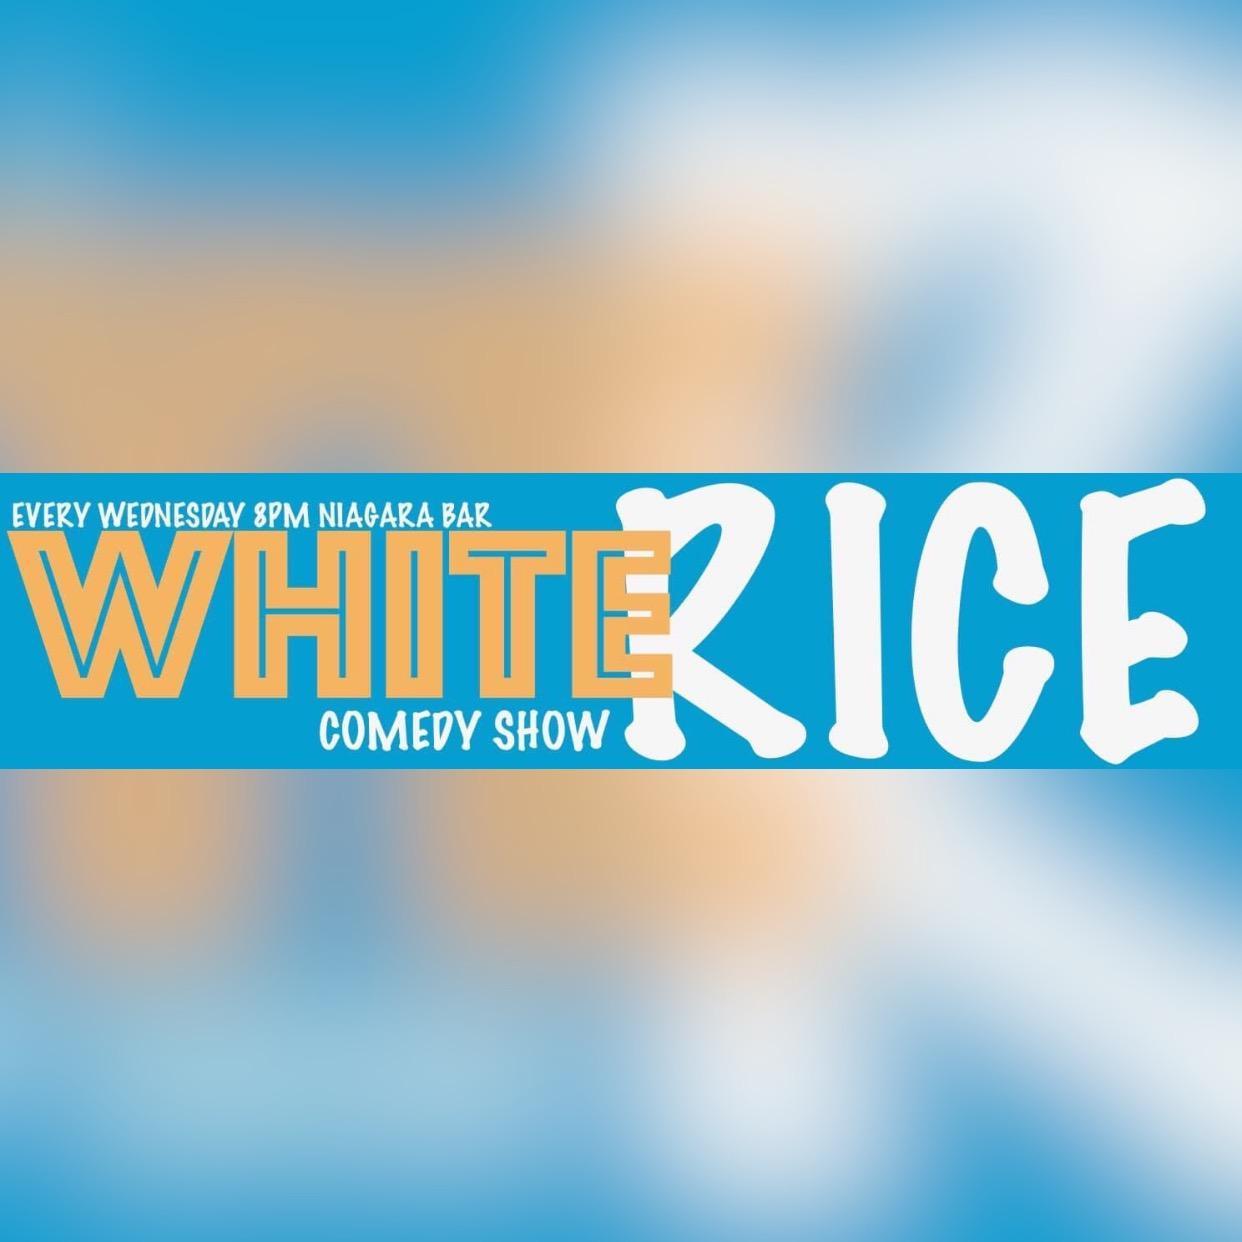 White Rice Comedy Show